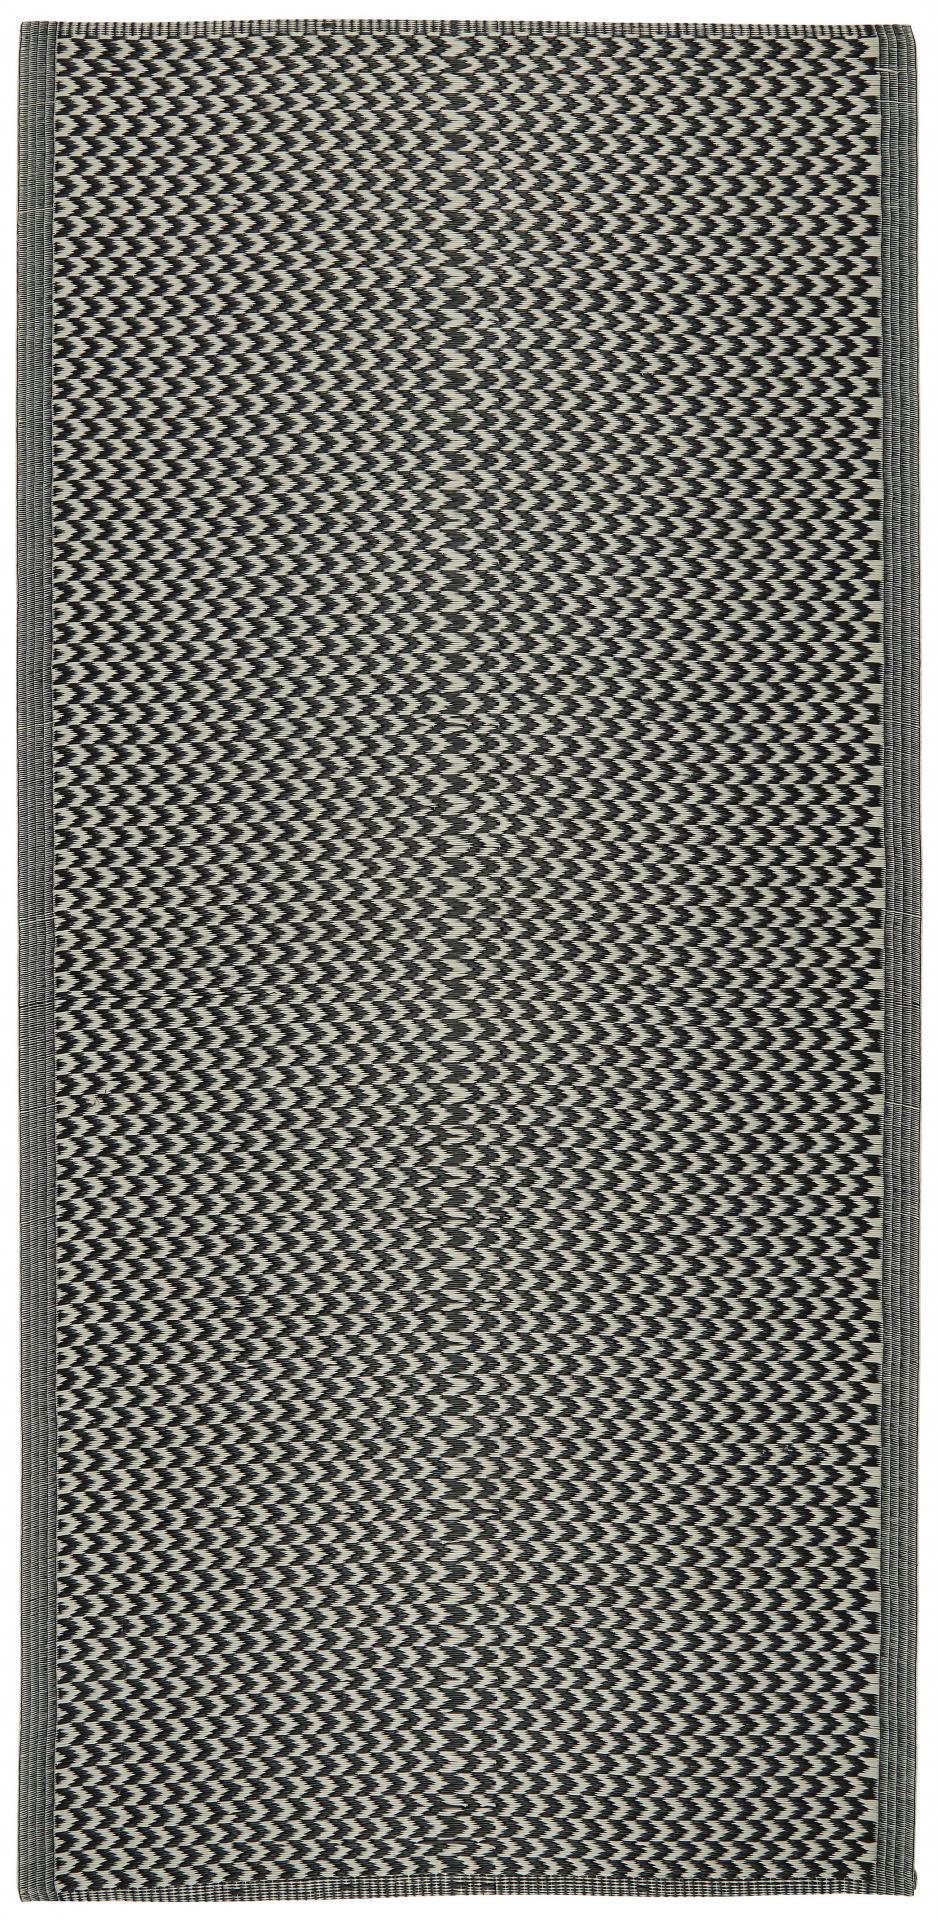 IB LAURSEN Plastový koberec Recycled Black&White 90x180 cm, černá barva, bílá barva, plast